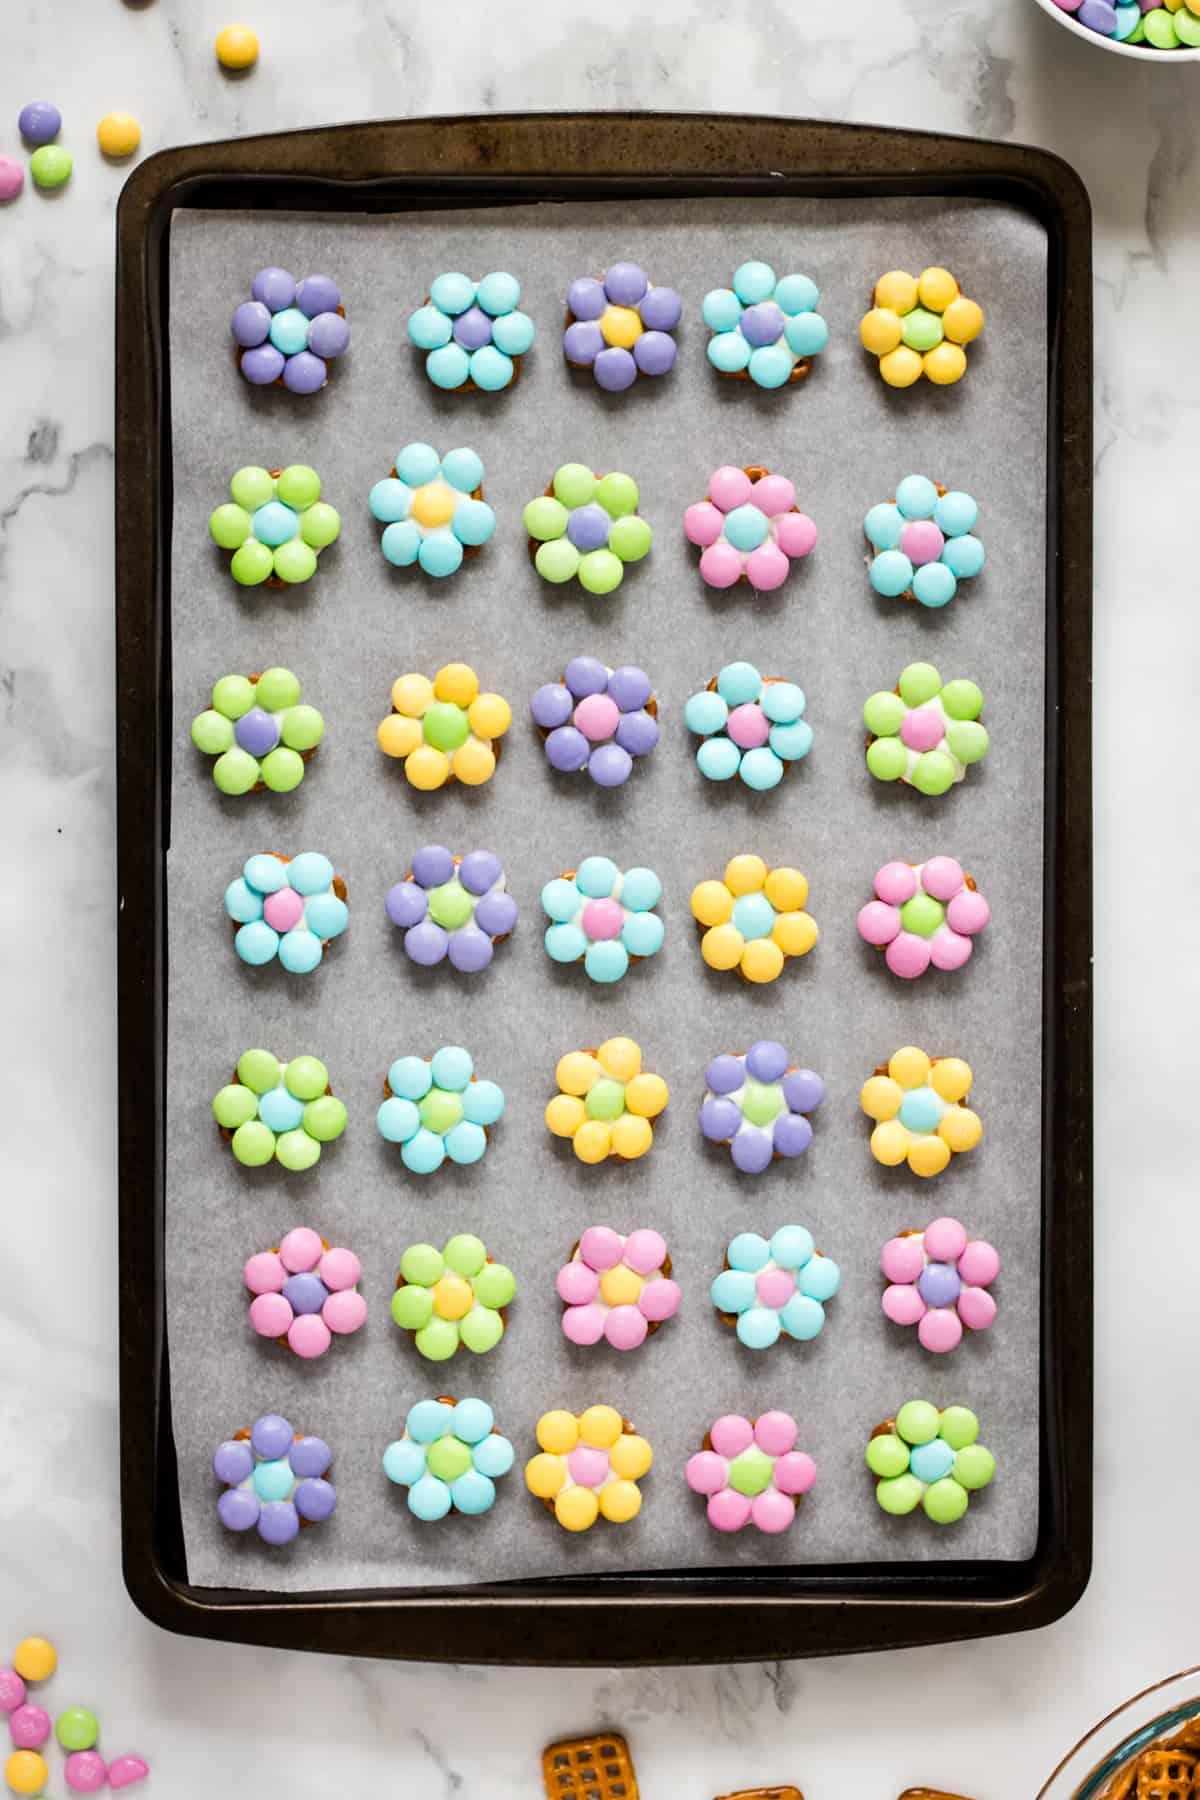 M&M Pretzel flower bites arranged in even rows on lined baking sheet